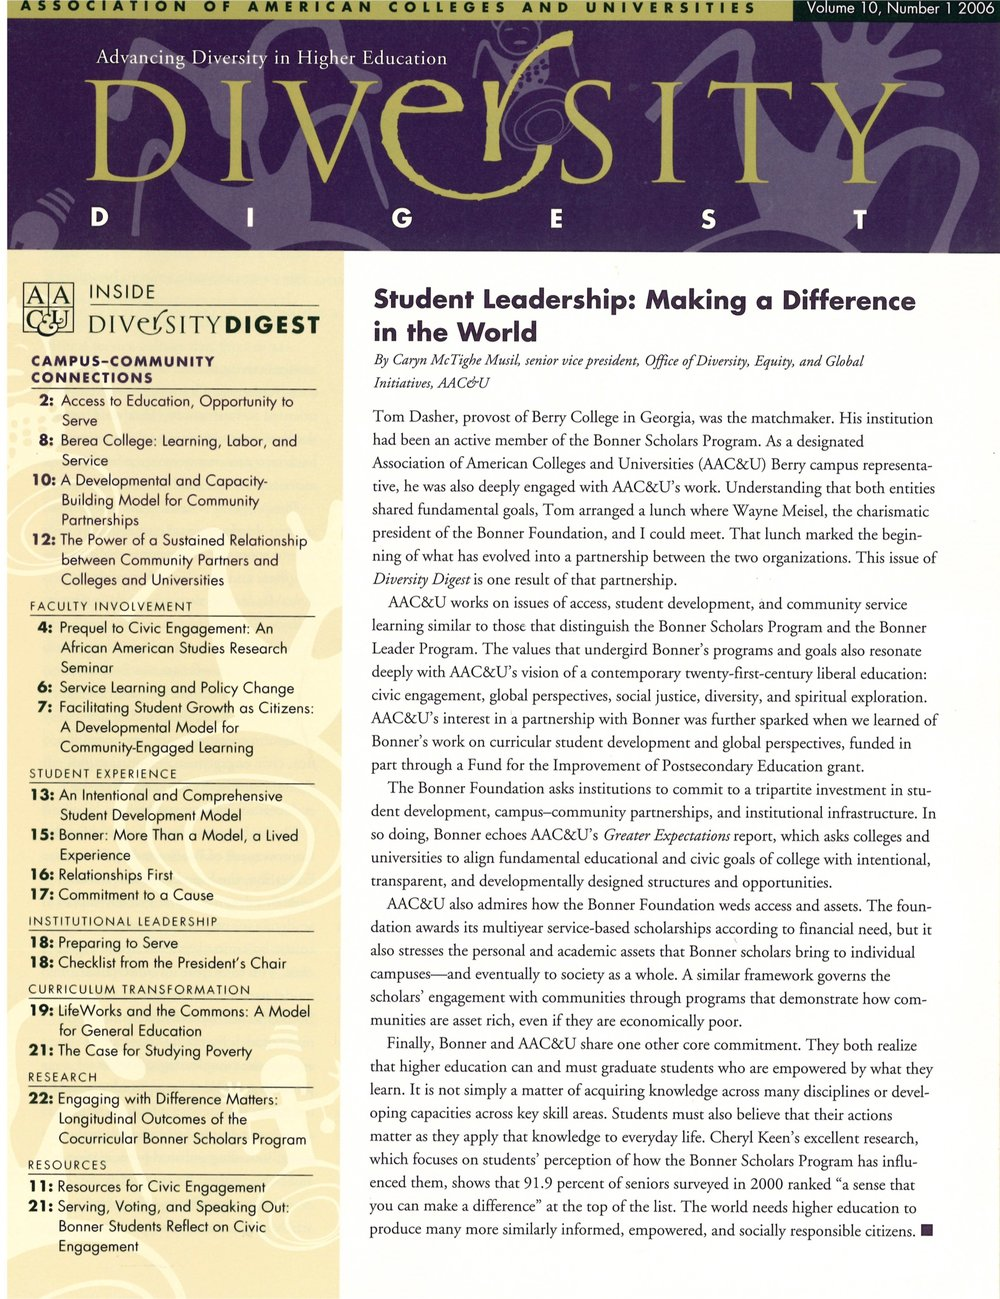 DiversityDigest2006_pdf__1_page_.jpg